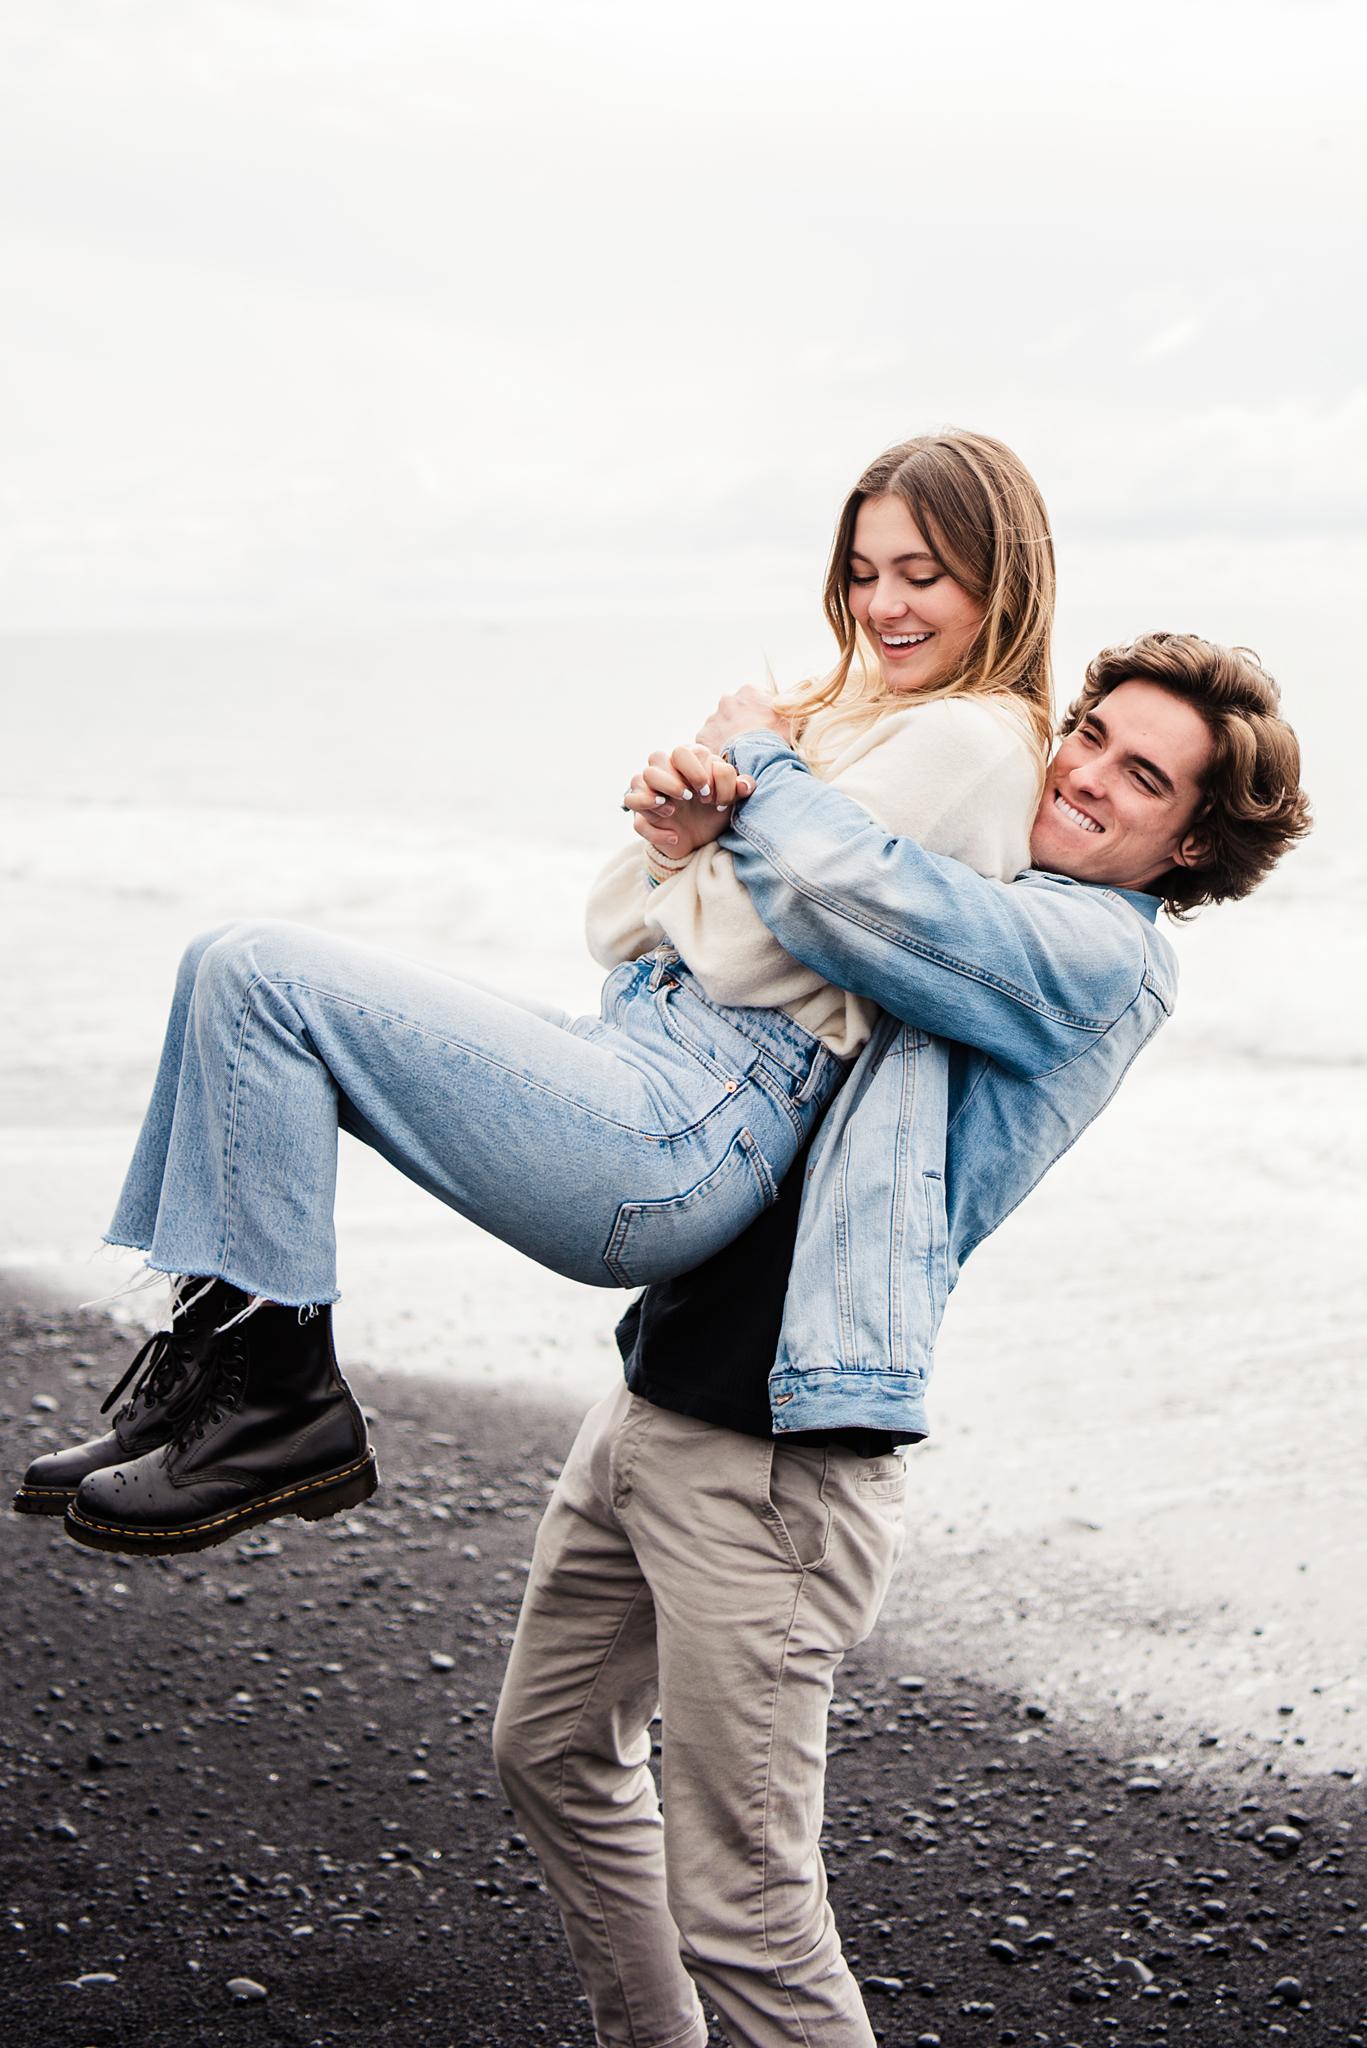 Iceland_Reynisfjara_Black_Sand_Beach_Couples_Session_JILL_STUDIO_Rochester_NY_Photographer_DSC_9739.jpg